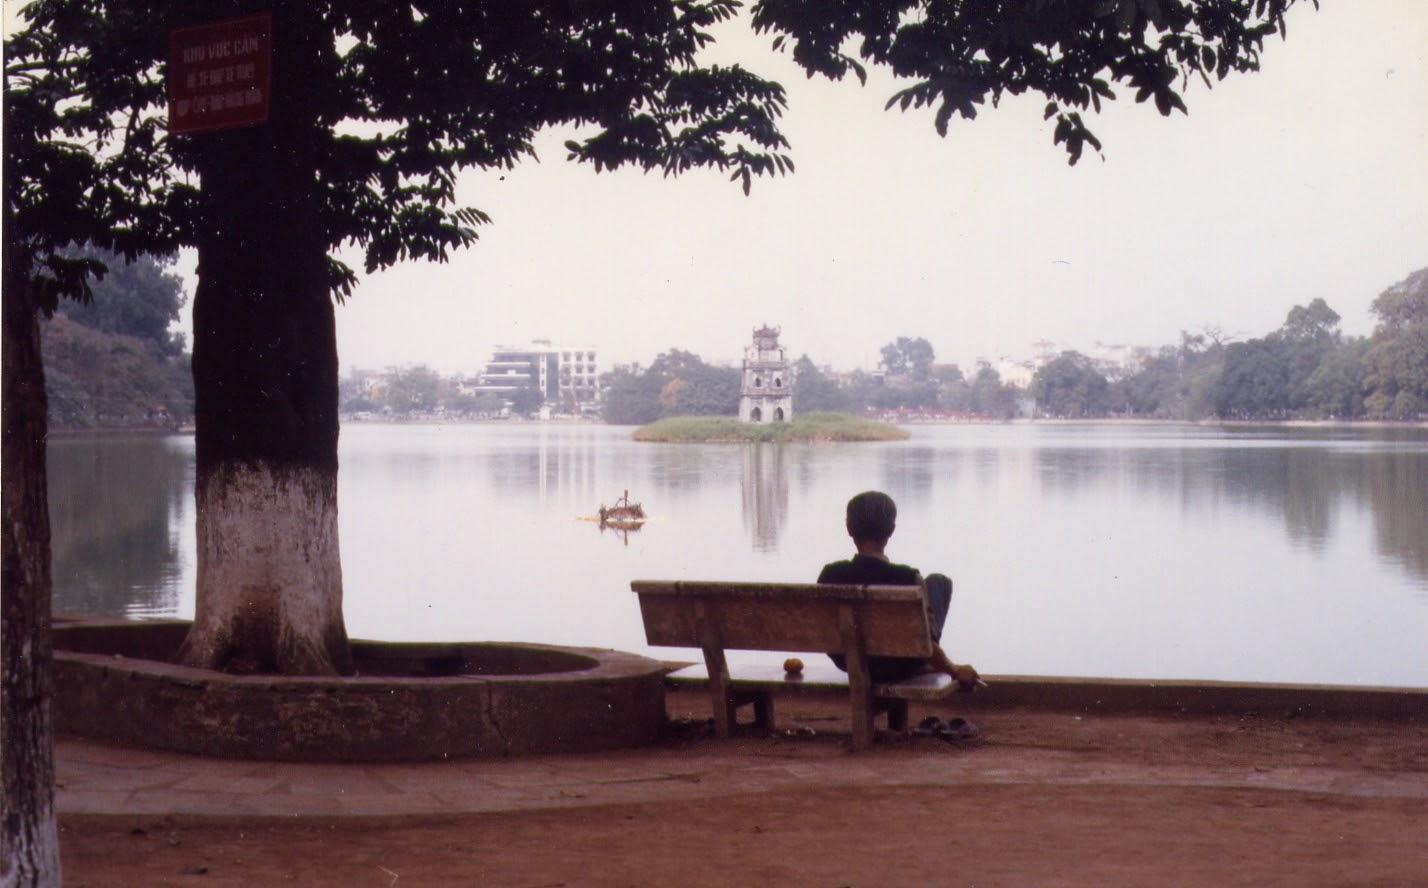 A man sits by Hoan Kiem Lake in Hanoi in 1997. Photo: Kyle Nunas